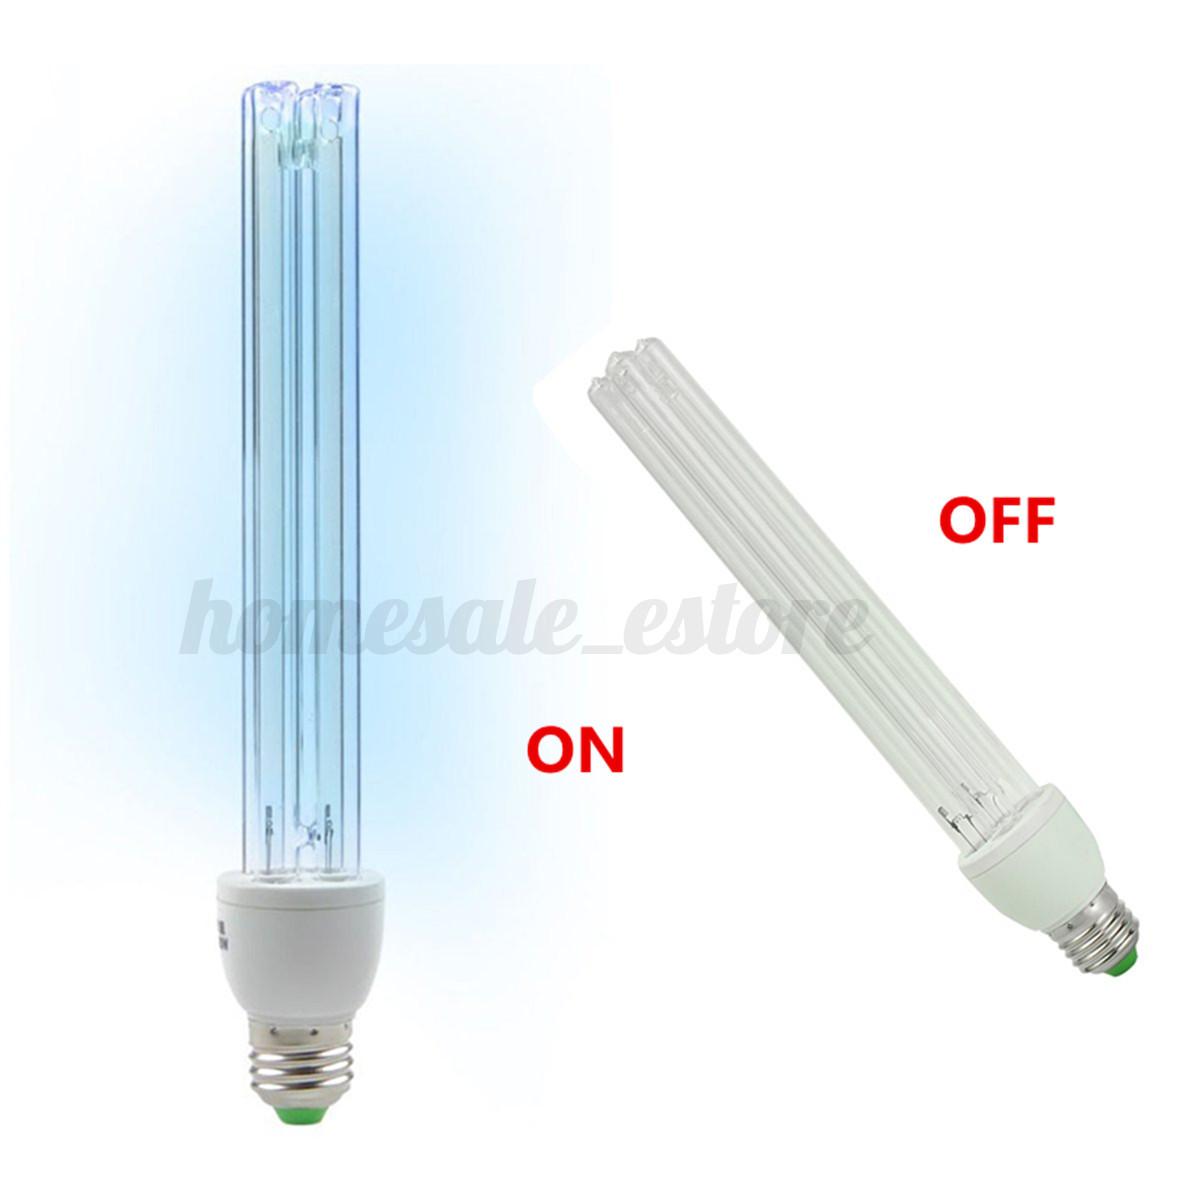 20W E27 Ultraviolet disinfection lamp 220V UVC Ozone Sterilization Mite Light